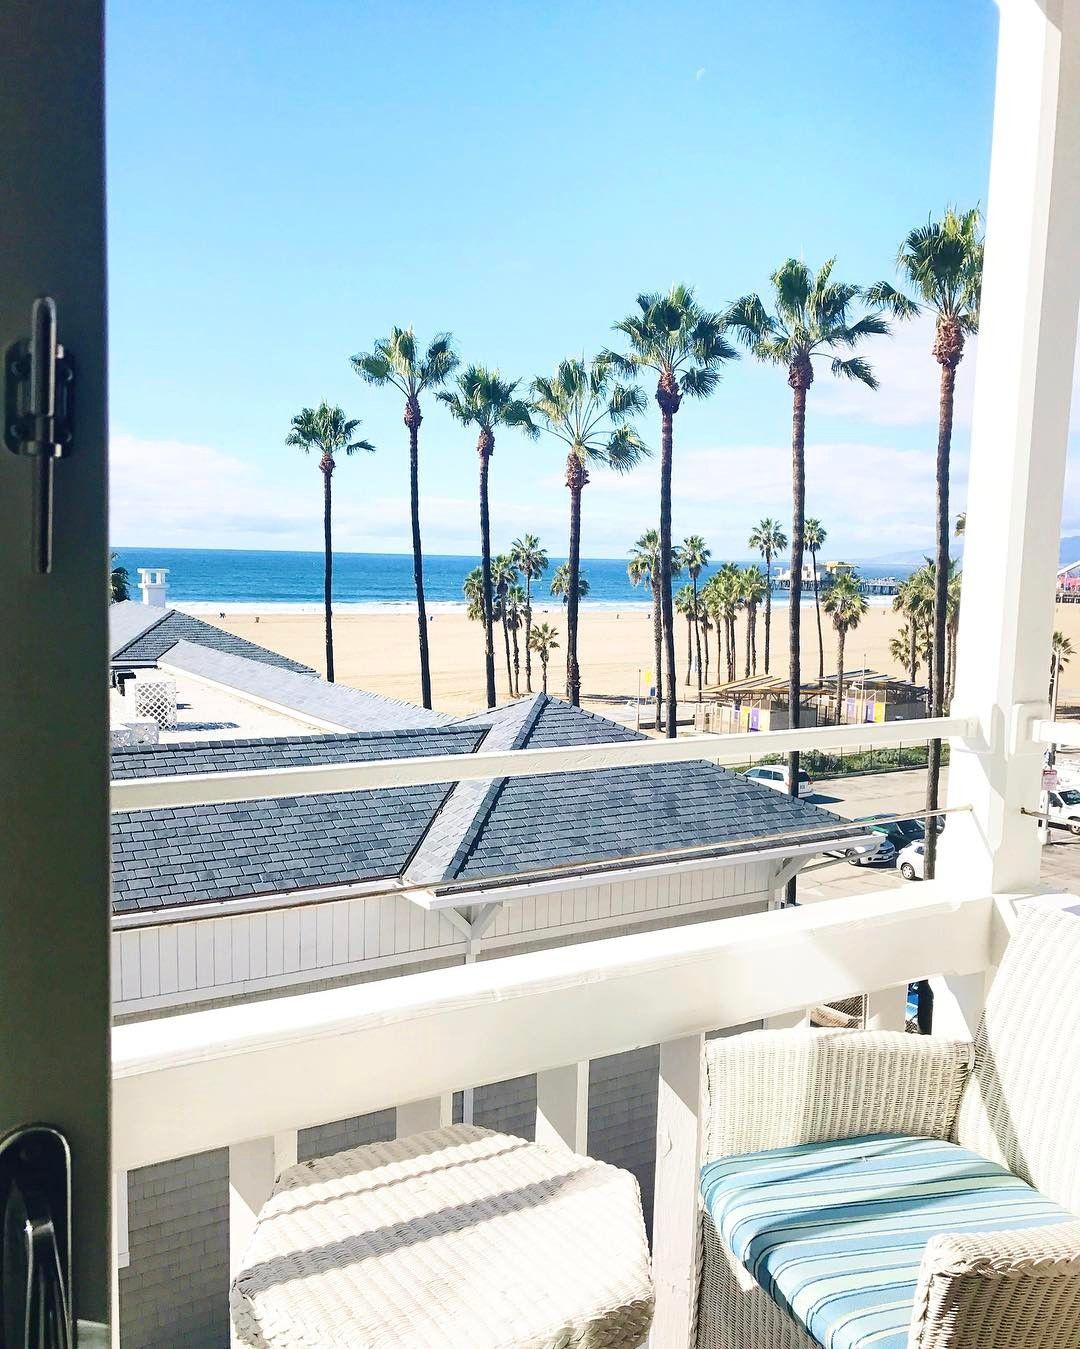 Santa Monica Beach Via Kattanita Instagram Santa Monica Hotels Santa Monica Santa Monica Beach House